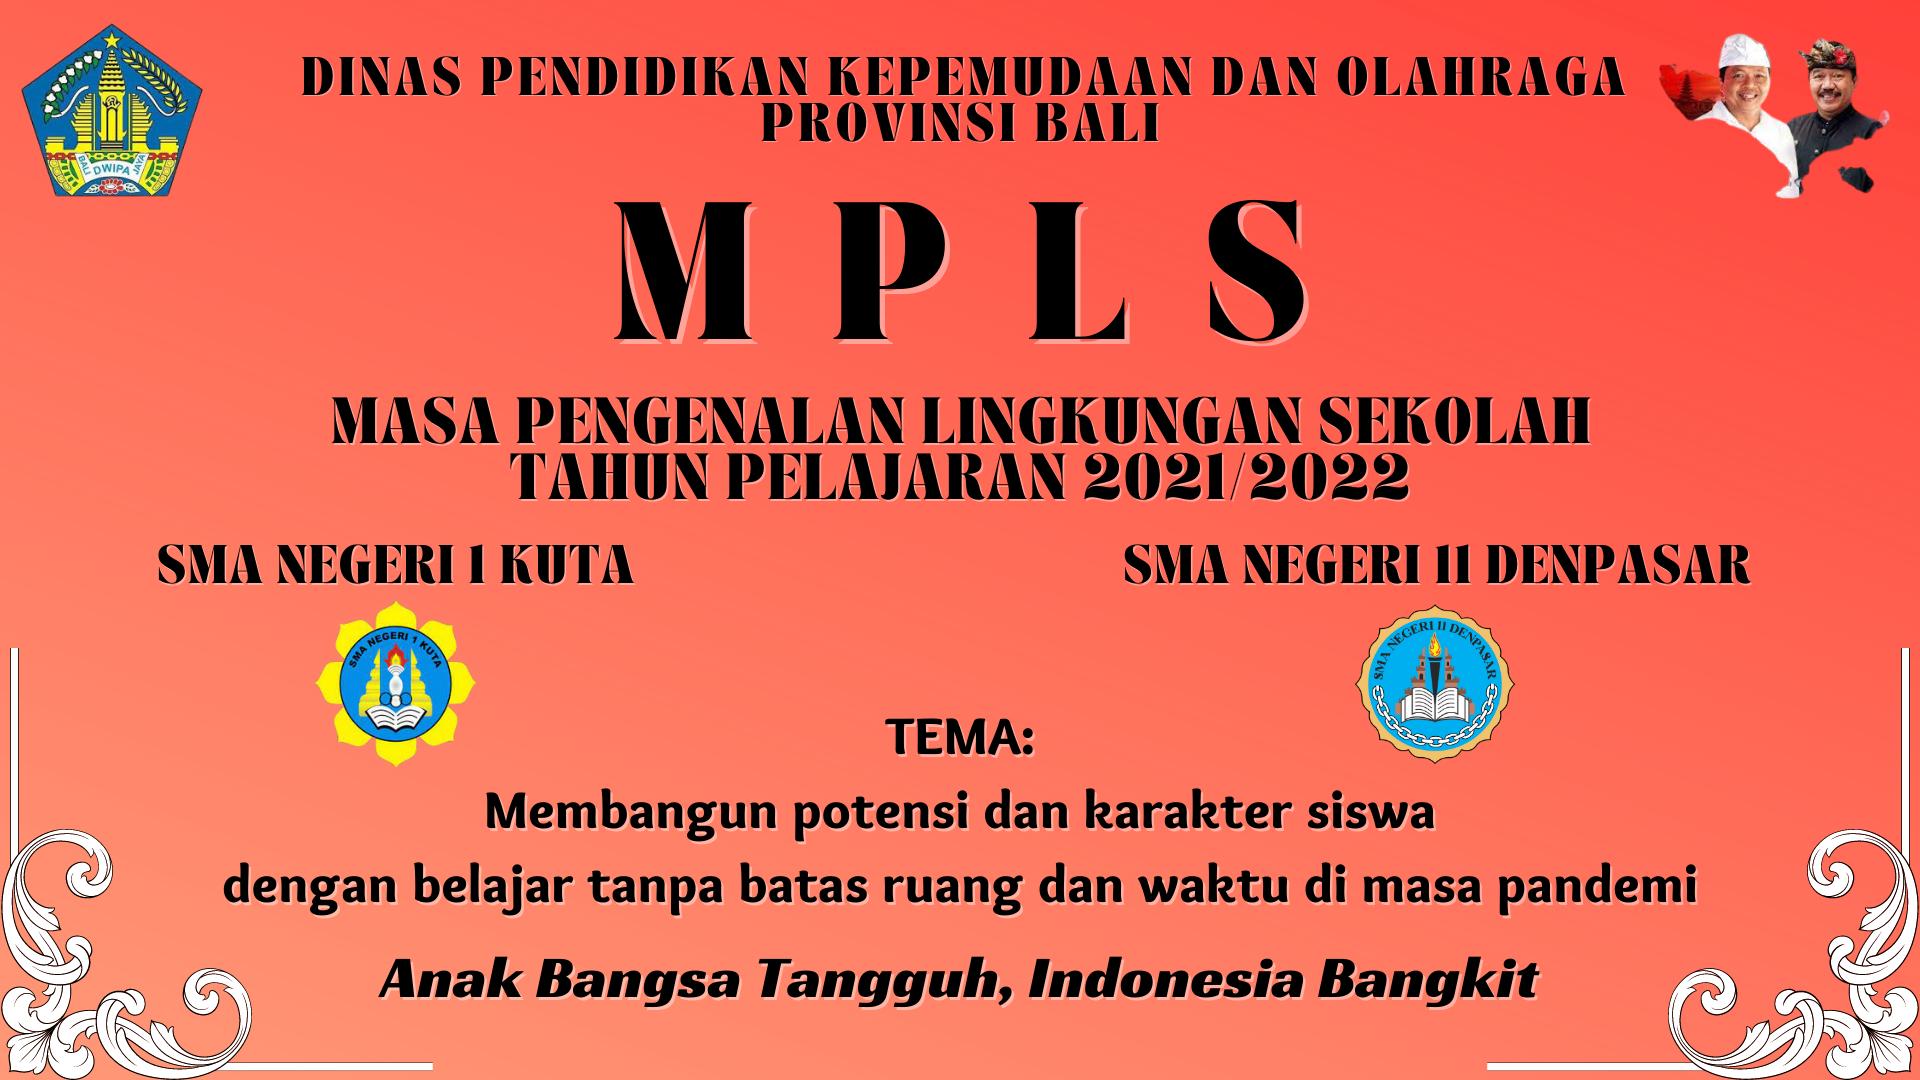 MPLS 2021/2022